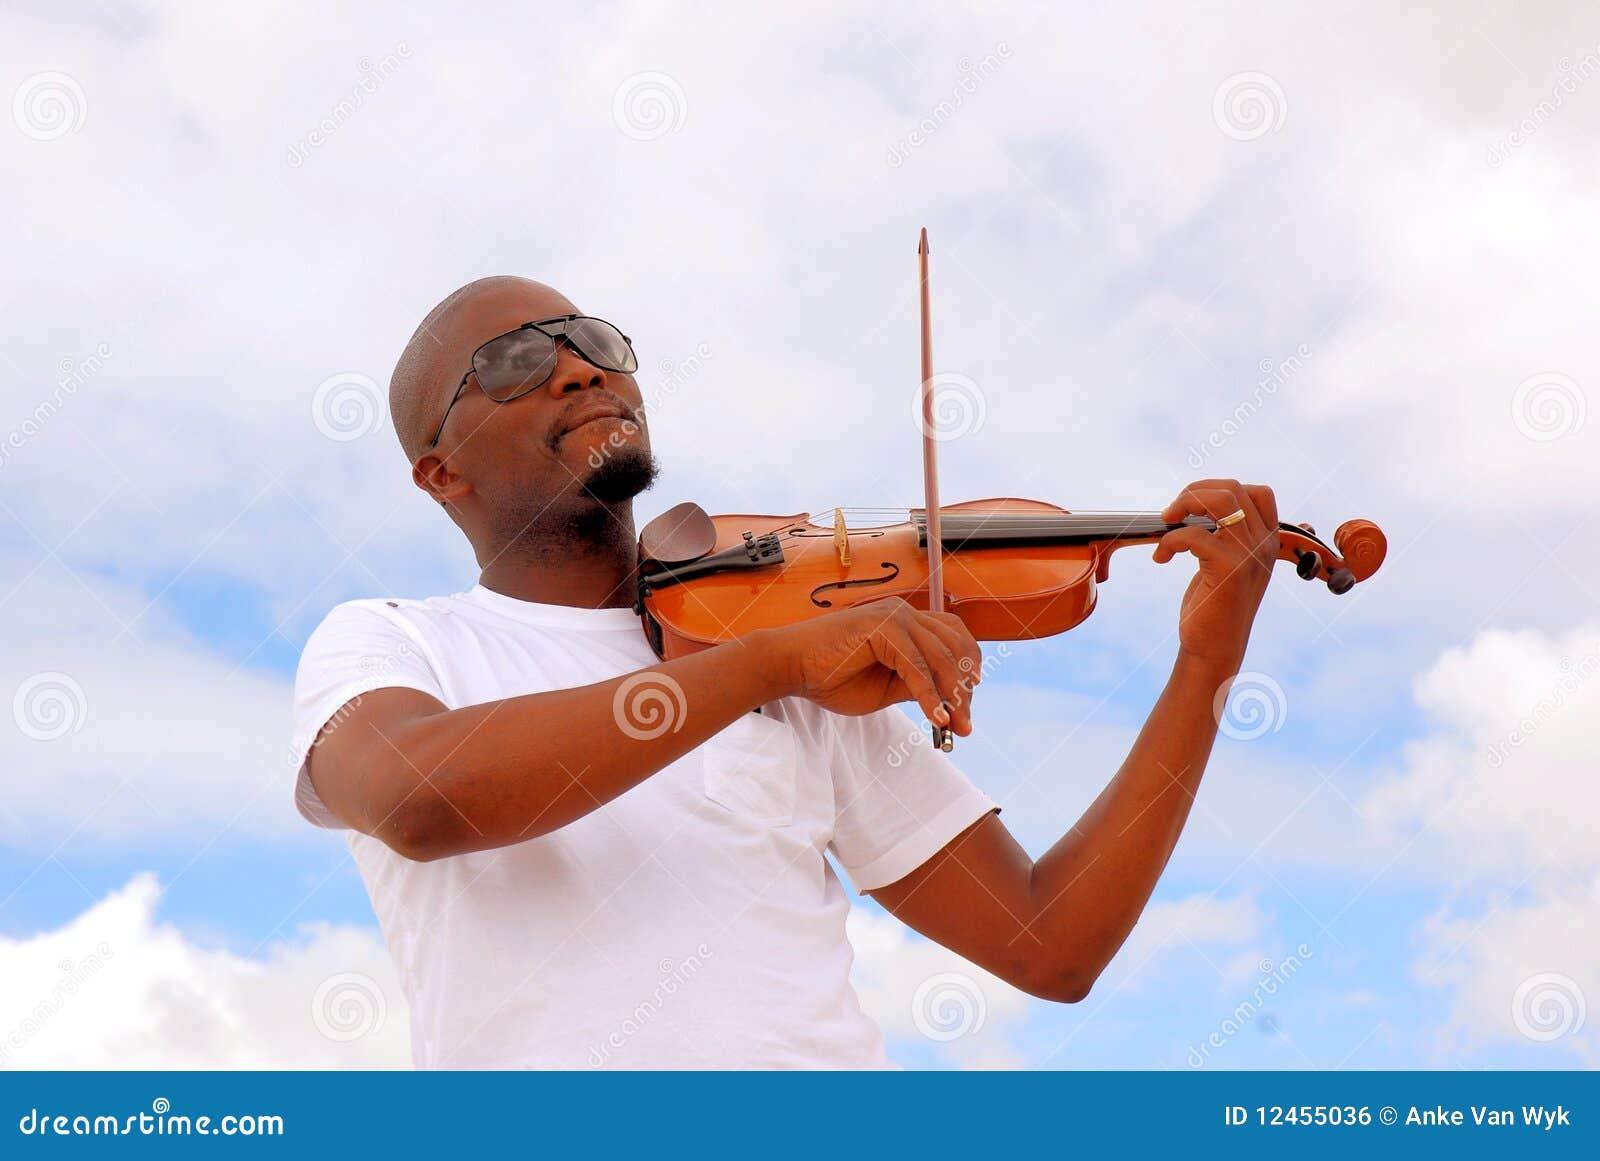 Black man playing violin